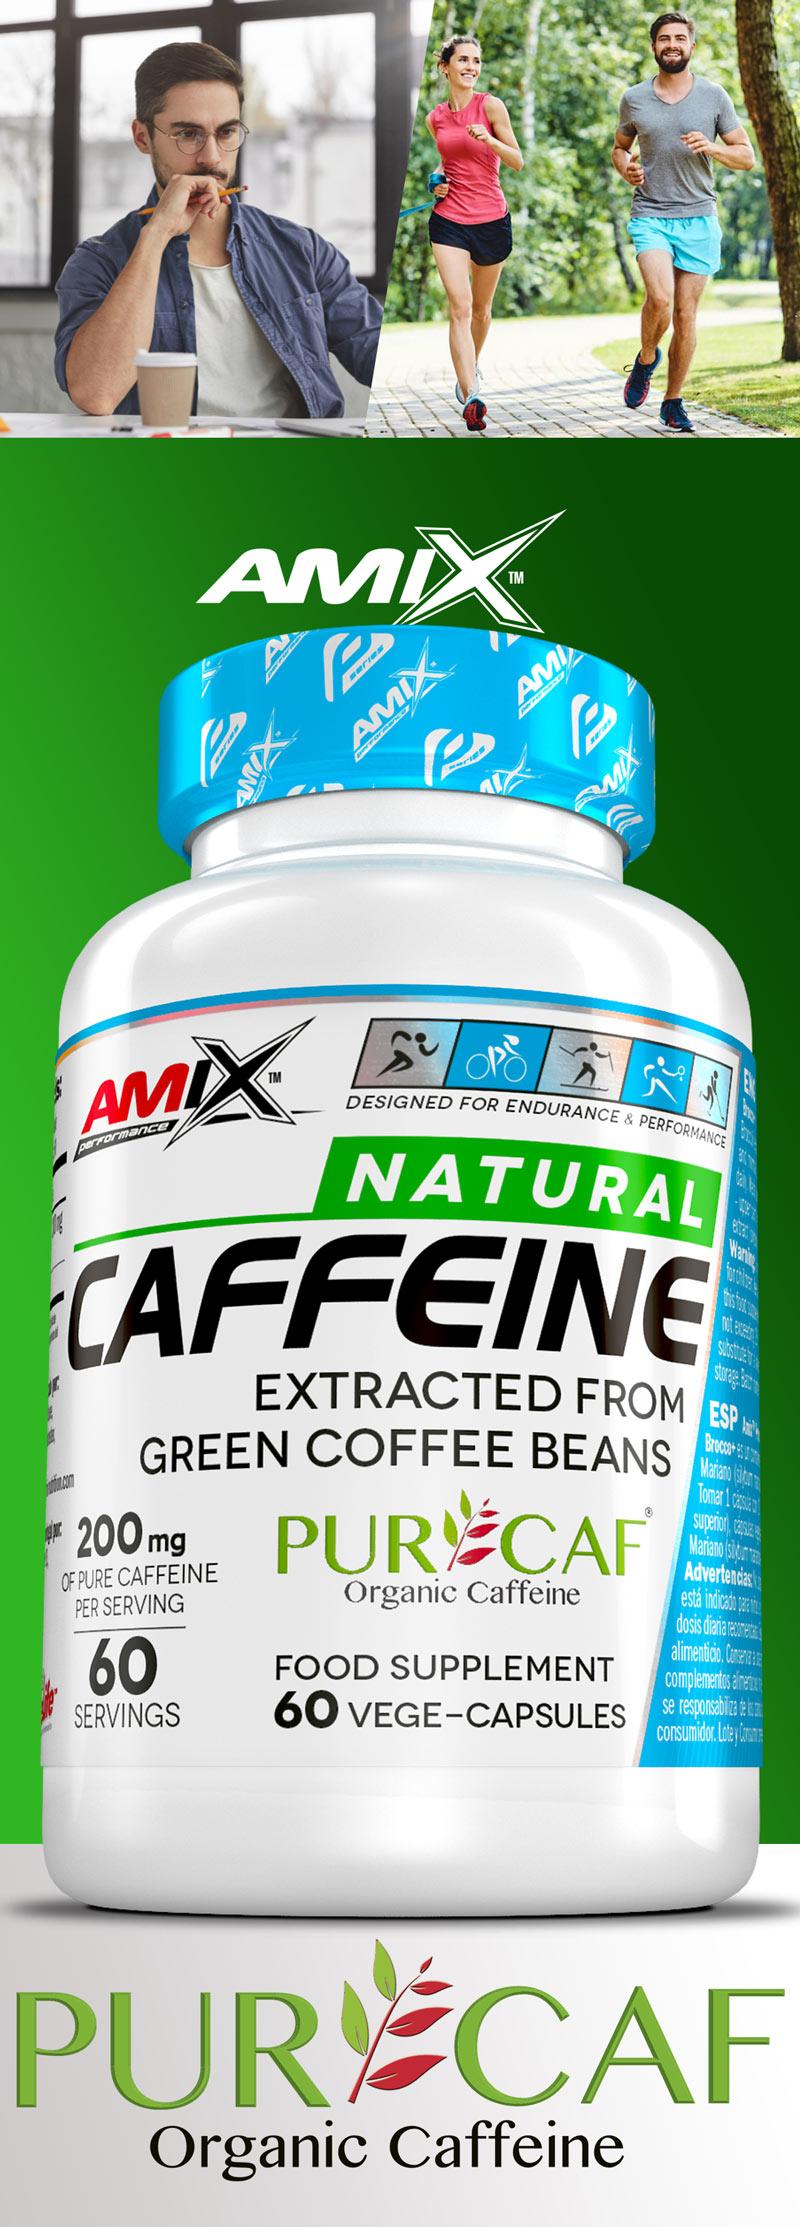 natural-caffeine-amix-perfomance